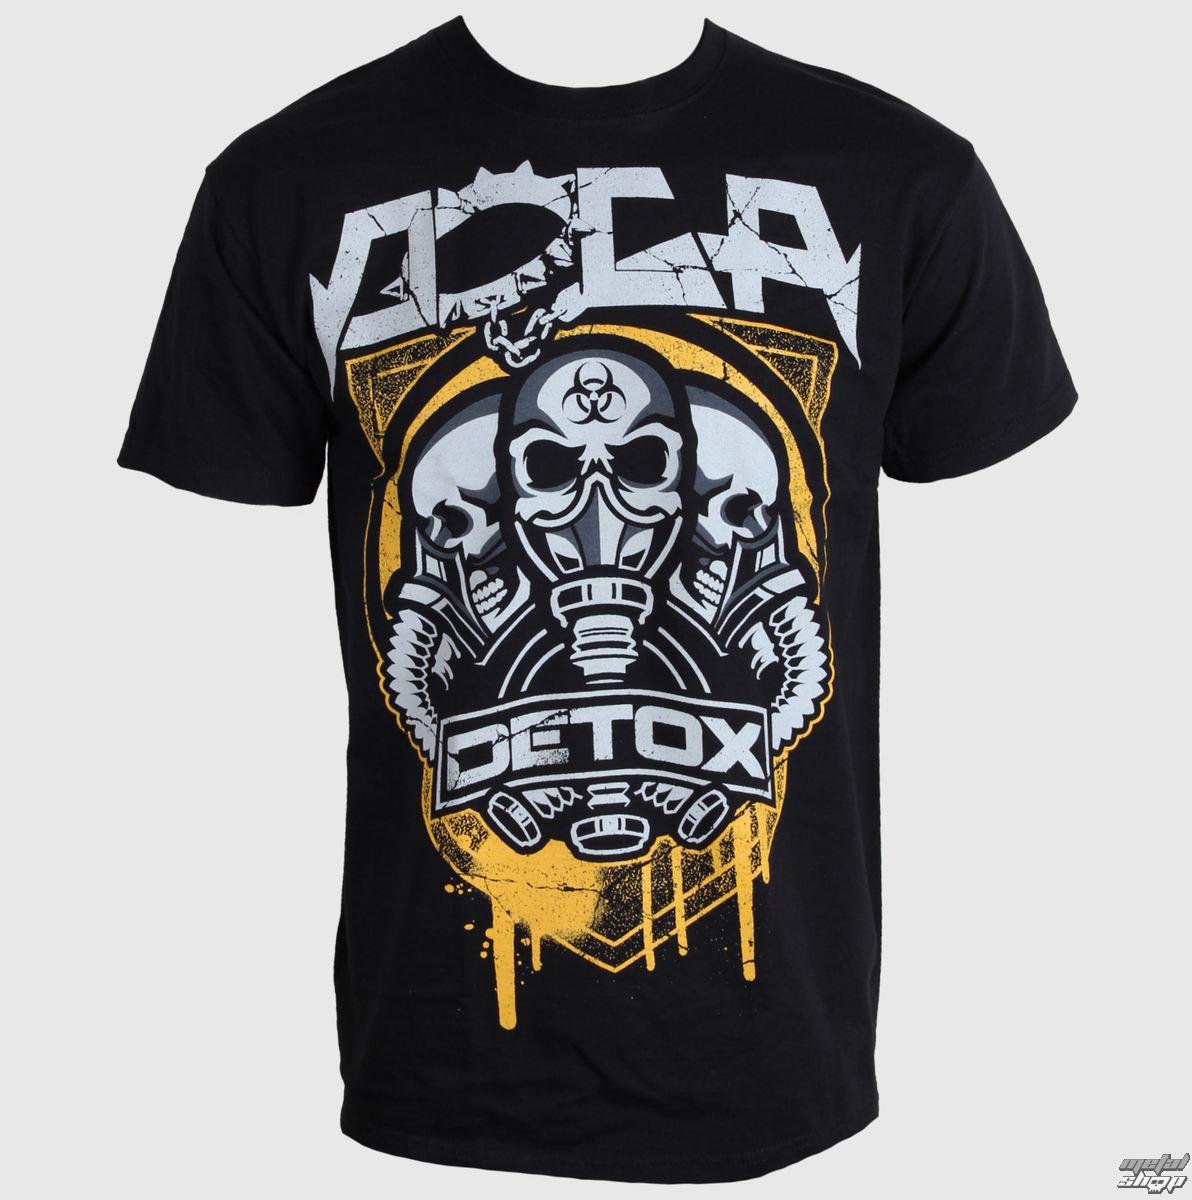 a2b4cae3cb0 tričko pánské Doga - Detox - D003 - metalshop.cz